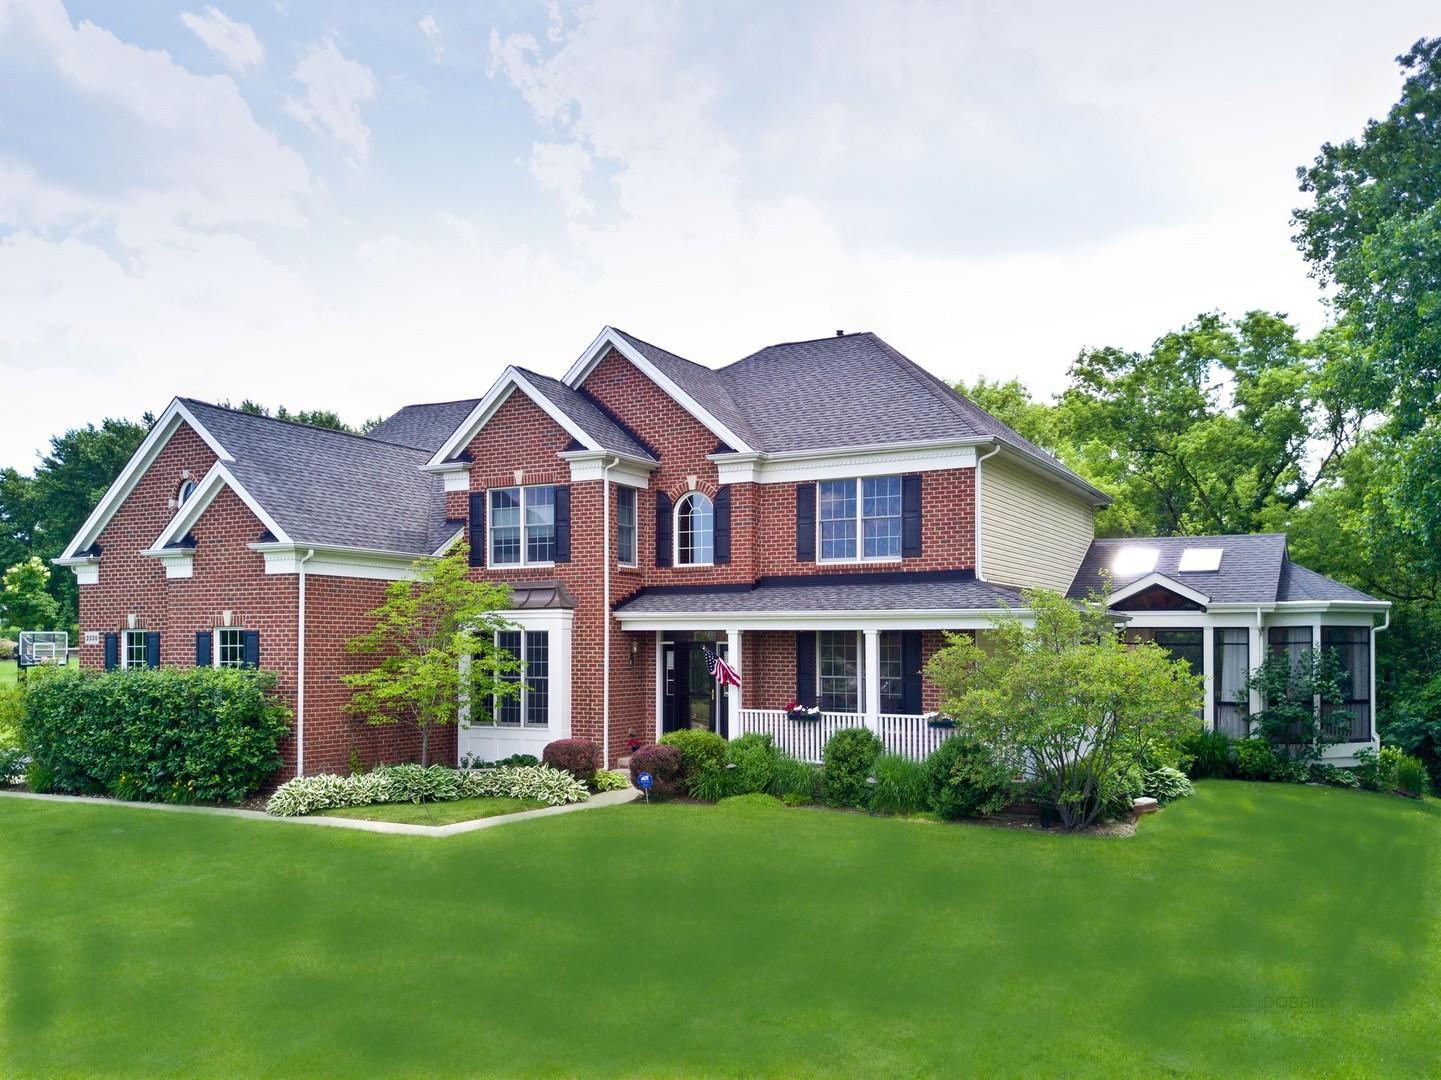 2530 Bayswater Circle, Gurnee, Illinois 60031